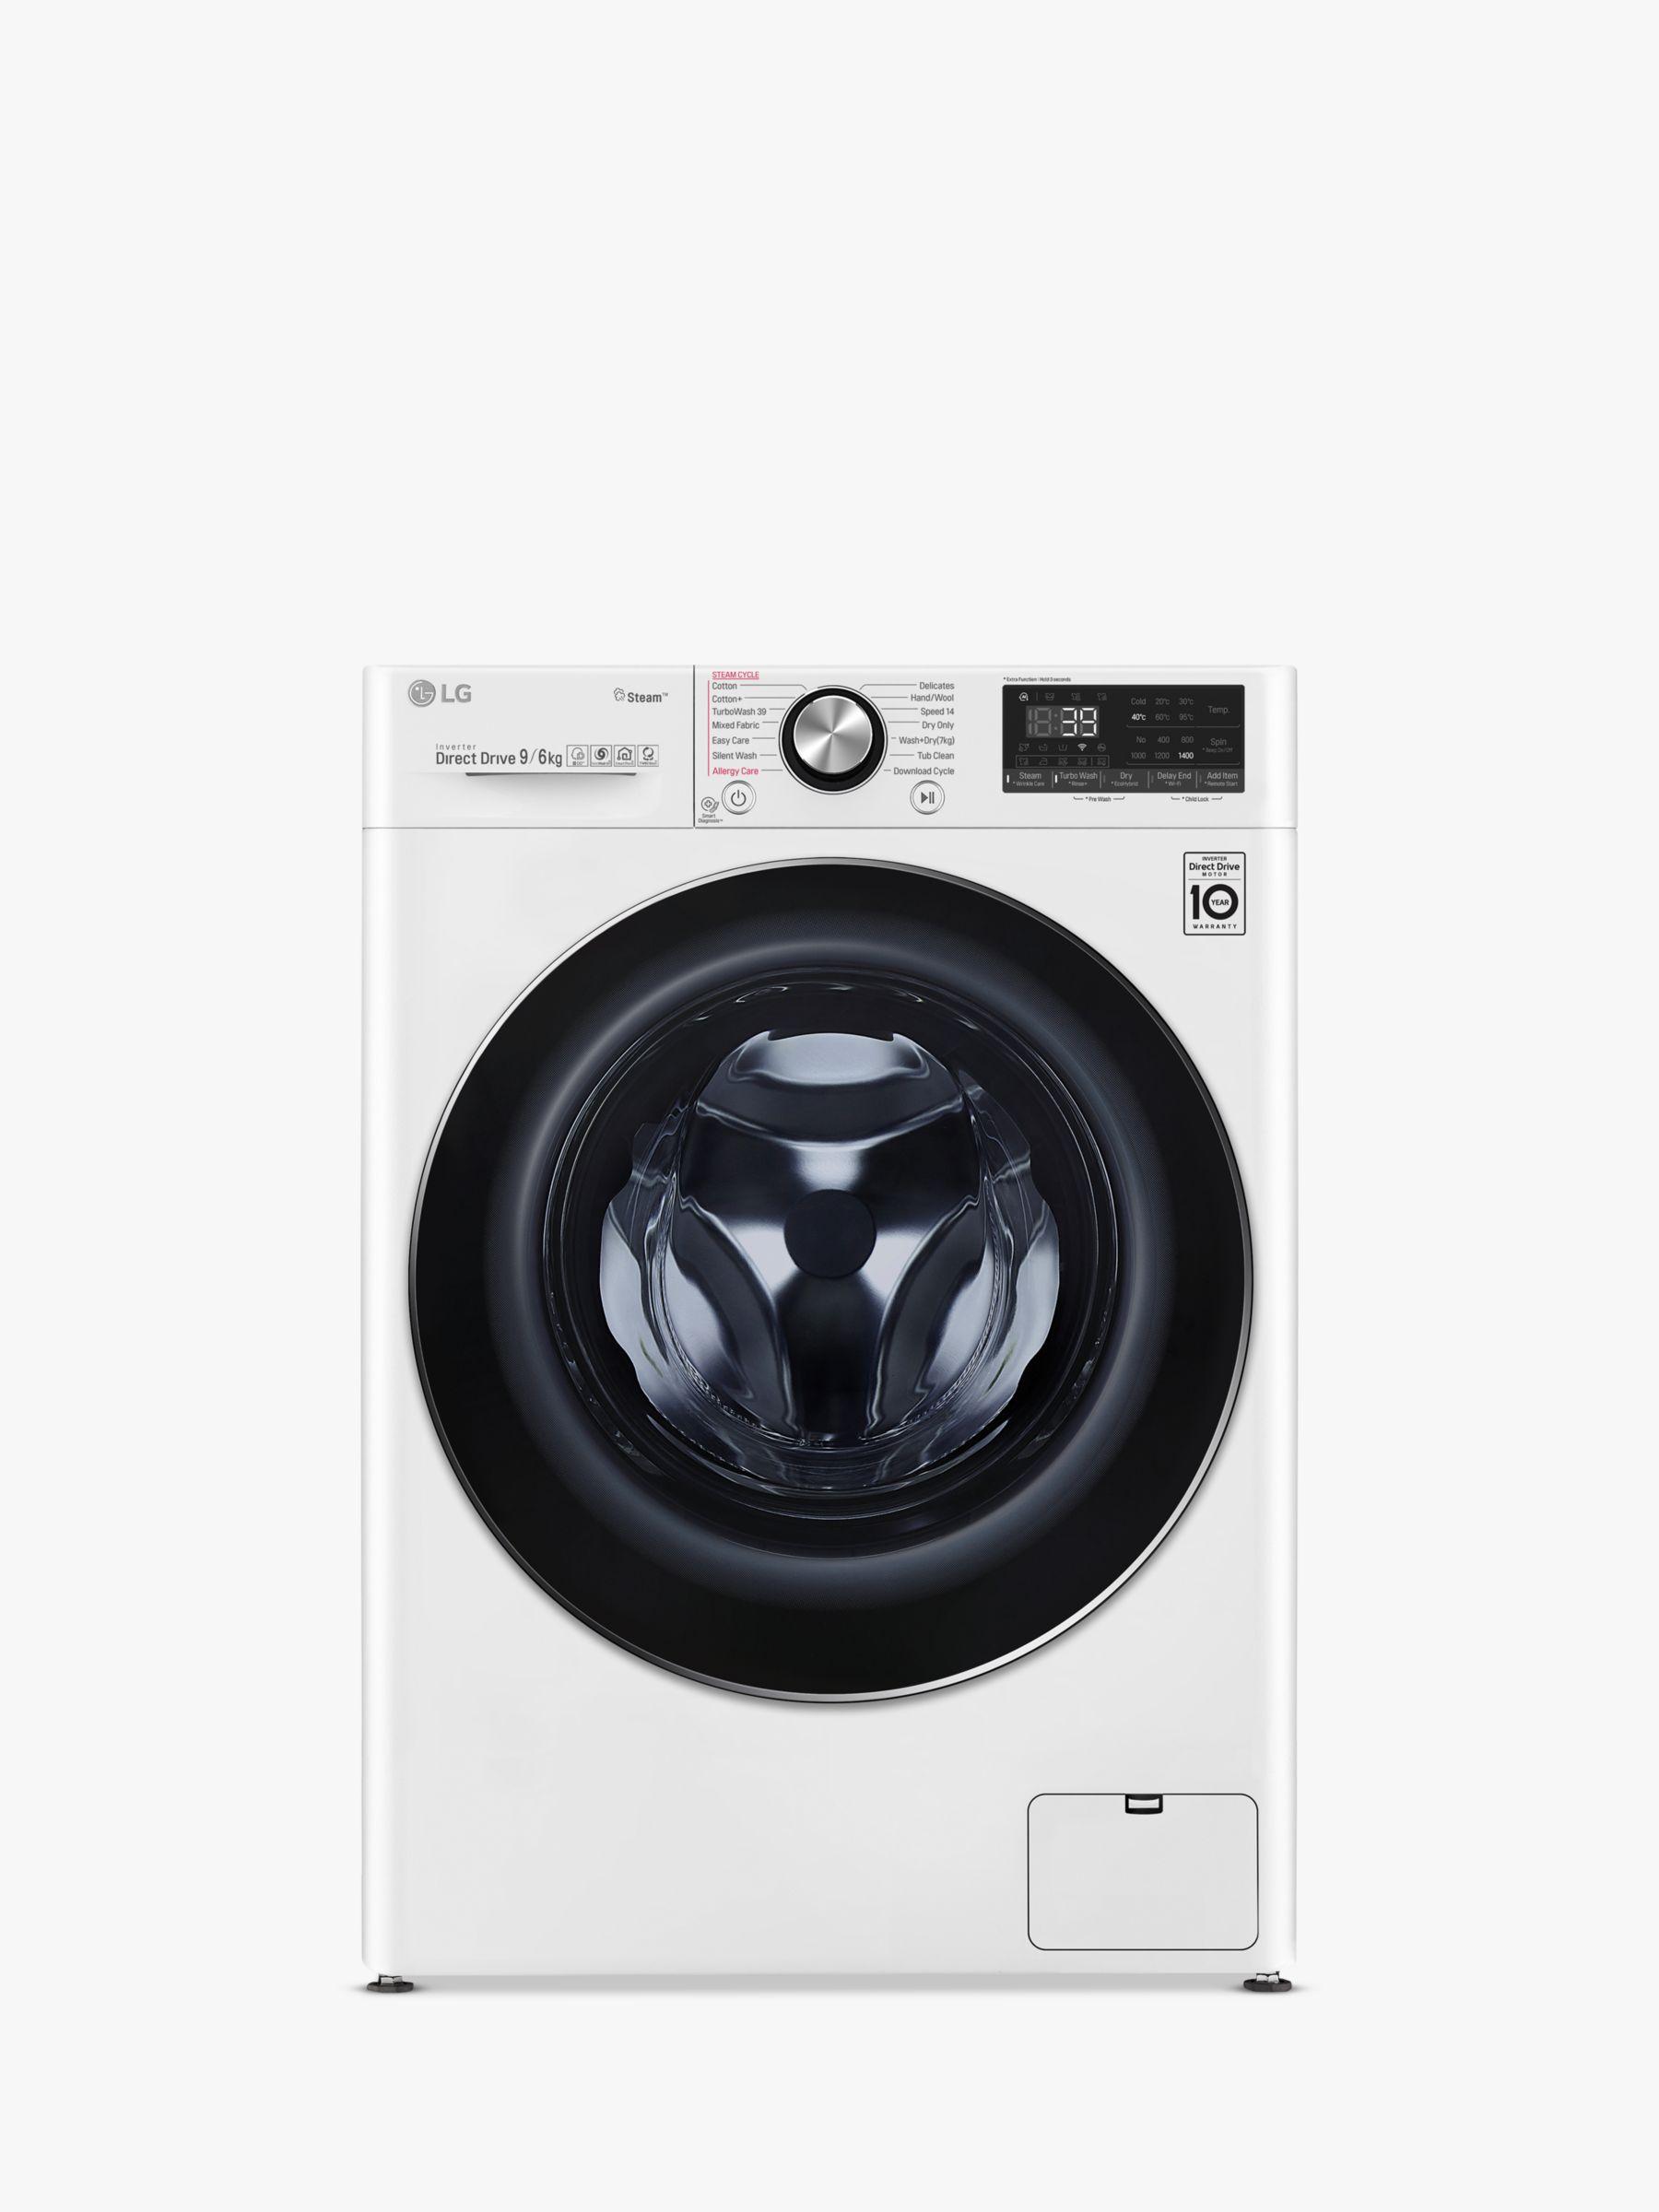 LG LG V900 FWV996WTS Freestanding Washer Dryer, 9kg Wash/6kg Dry Load, A Energy Rating, 1400rpm Spin, White